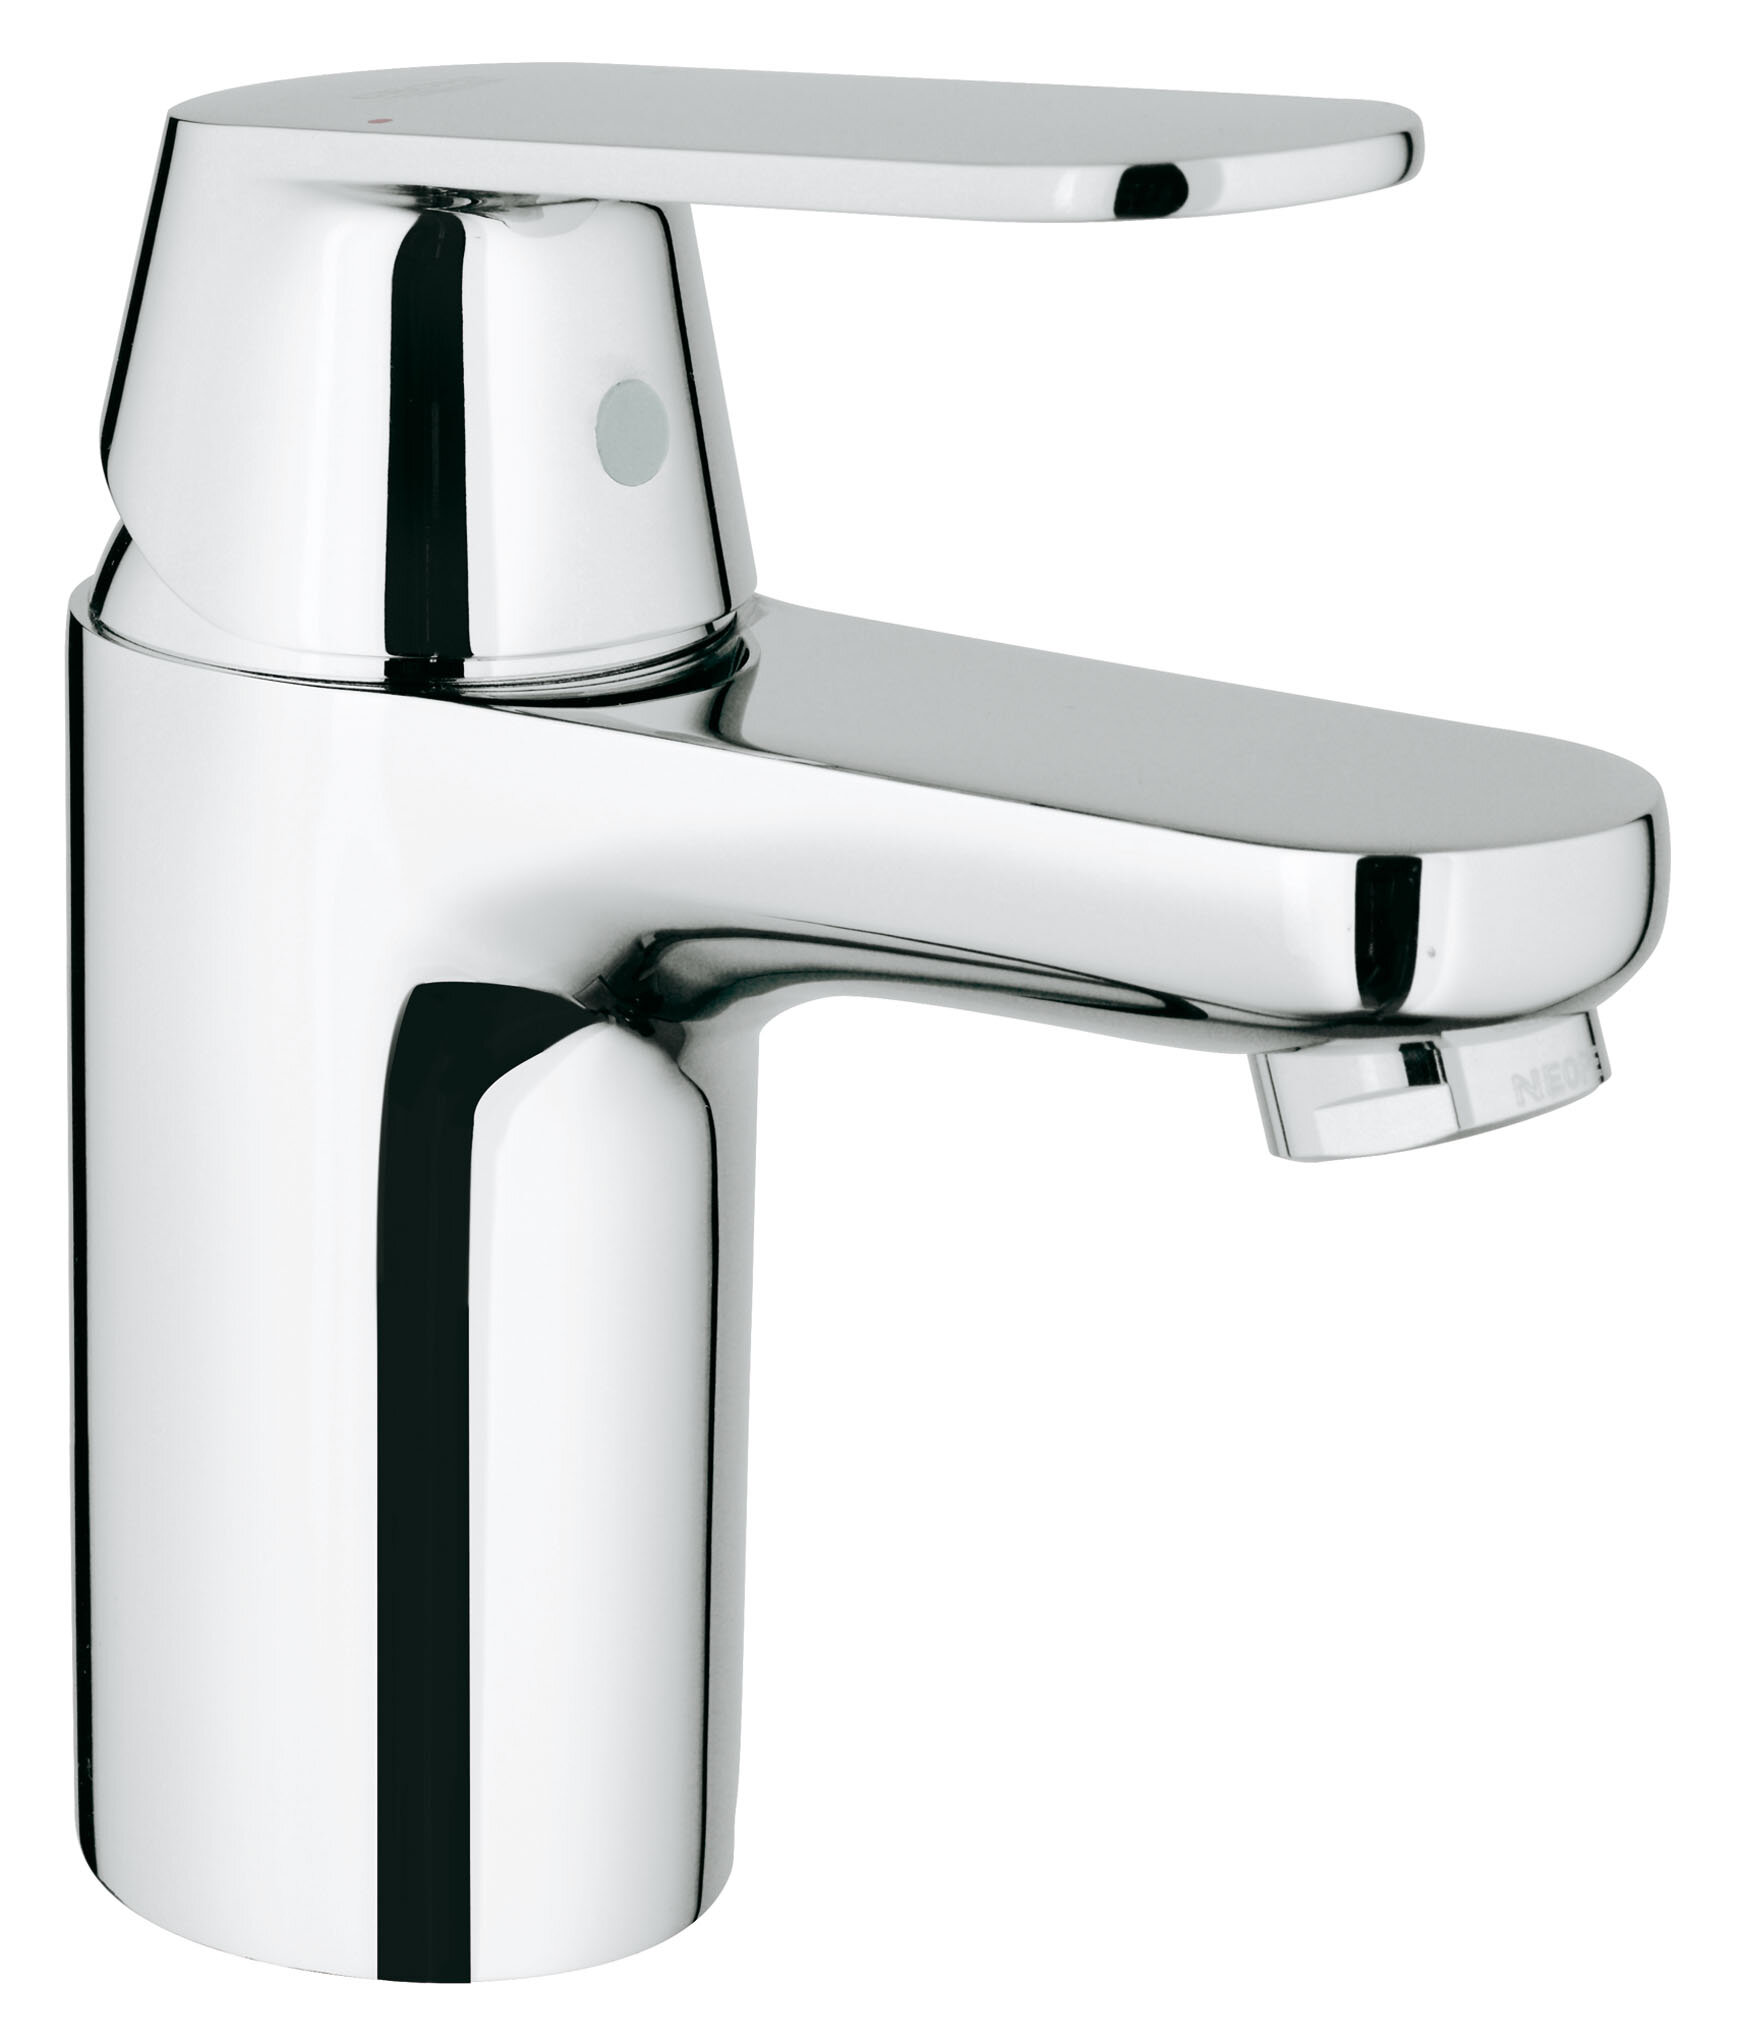 Grohe Eurosmart Single Hole Bathroom Faucet & Reviews   Wayfair